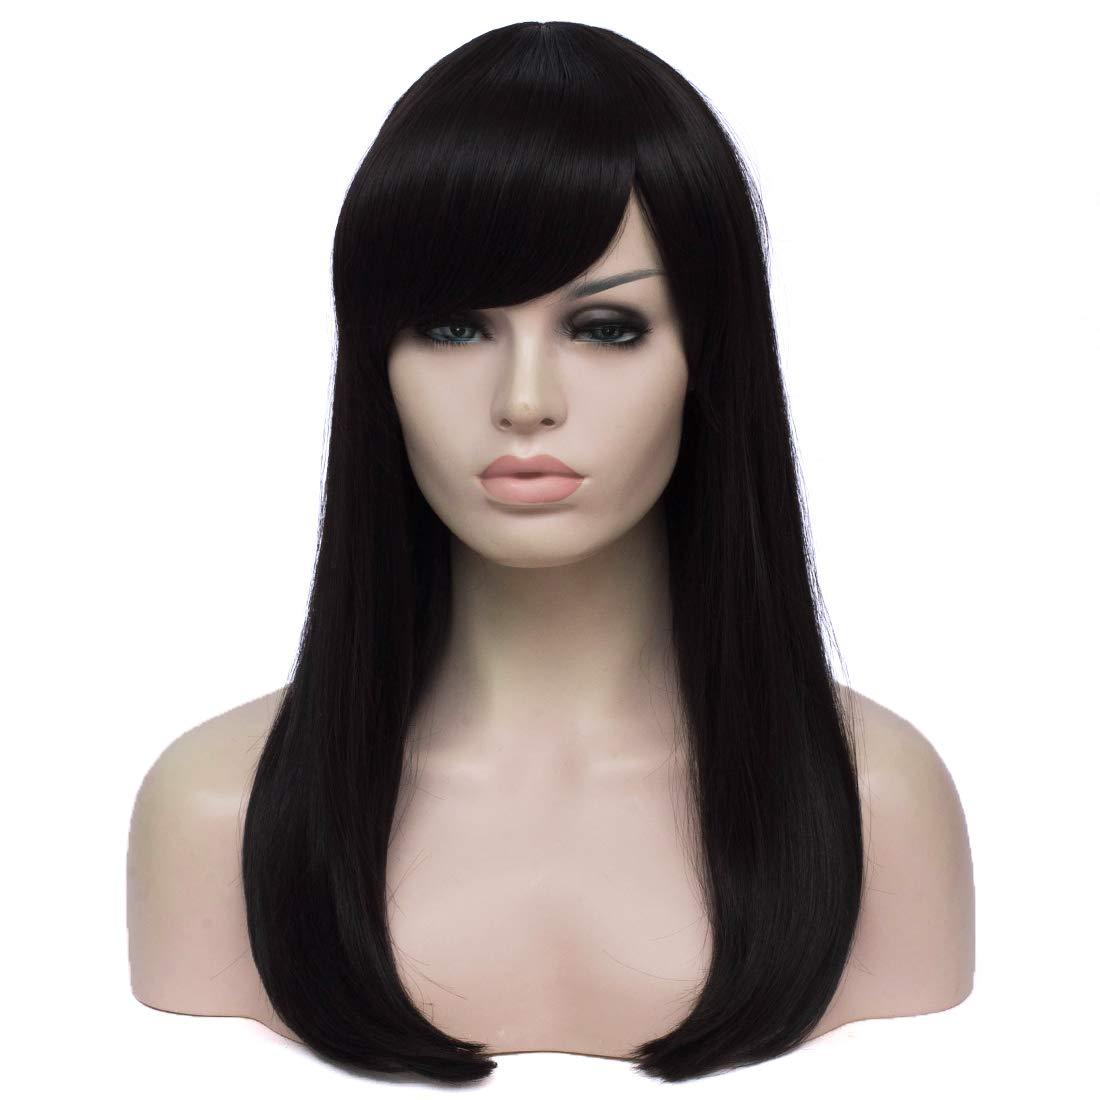 WGPFWIG Long Black Wig Straight Wig Side Bangs Wig for Women Party Halloween Wig (Black)